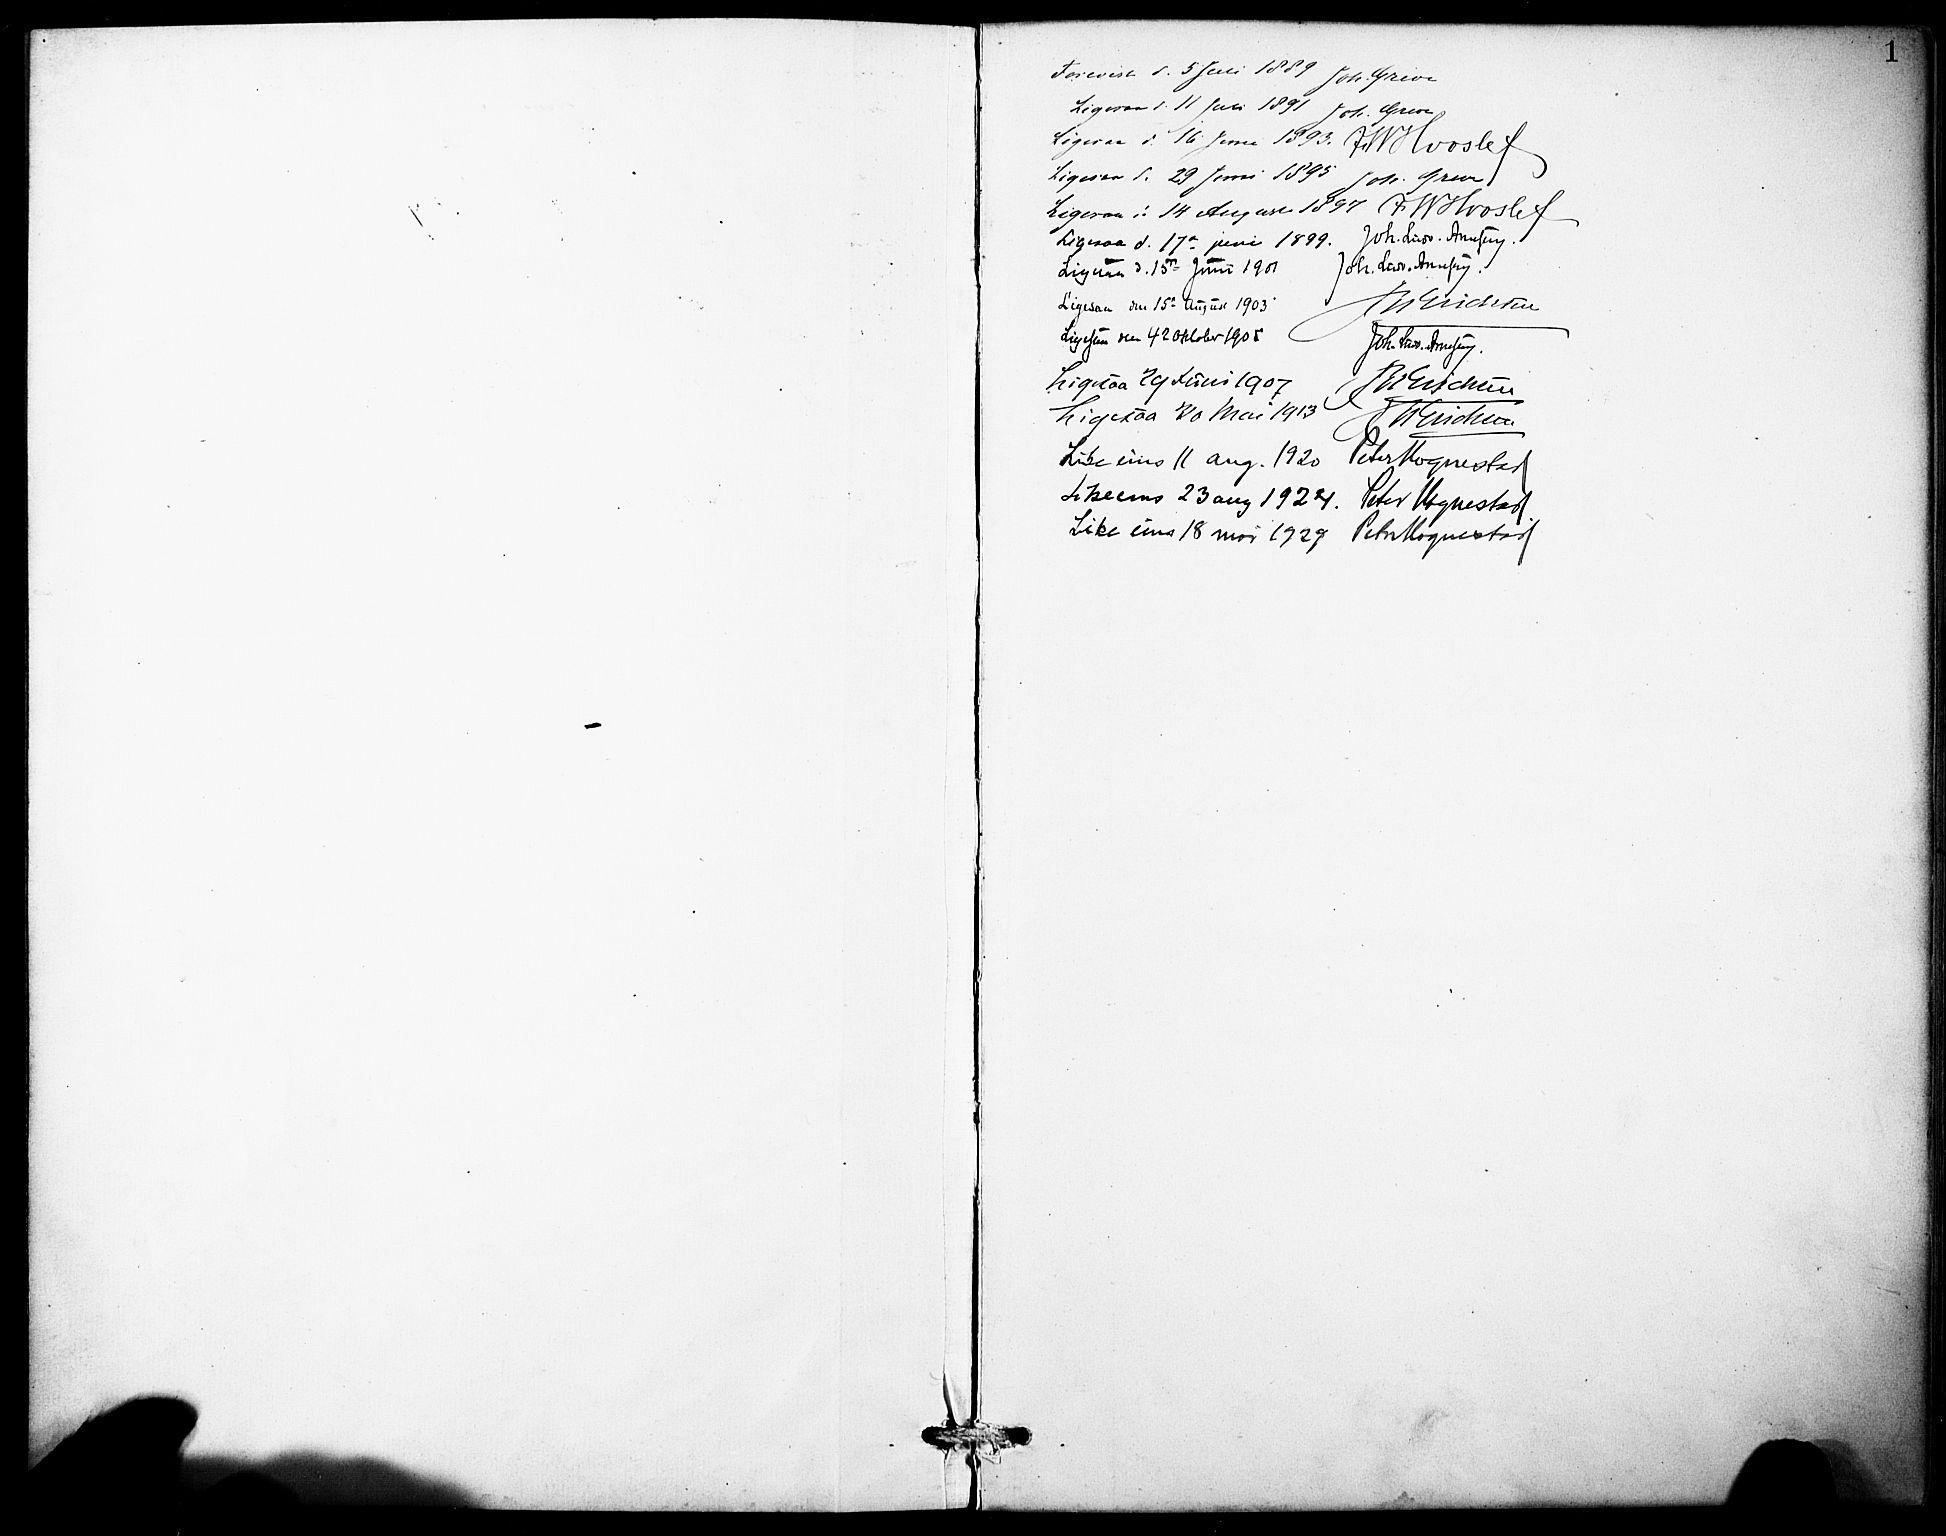 SAB, Aurland Sokneprestembete*, Klokkerbok nr. B 2, 1887-1929, s. 1